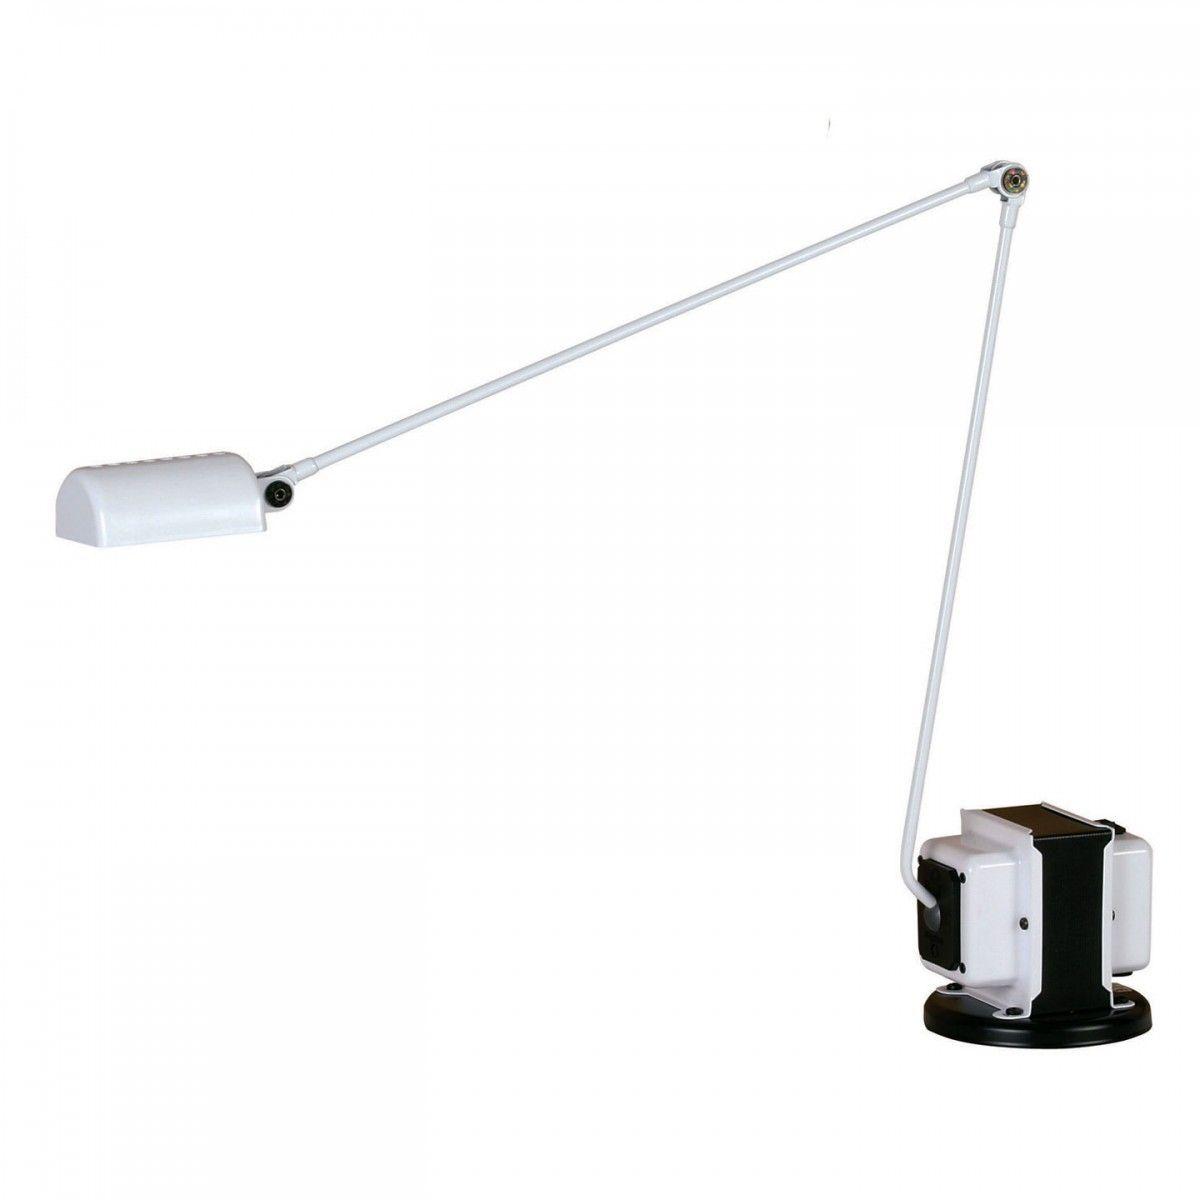 Daphine Tavolo classic lamp by Tommaso Cimini for Lumina Italia ...